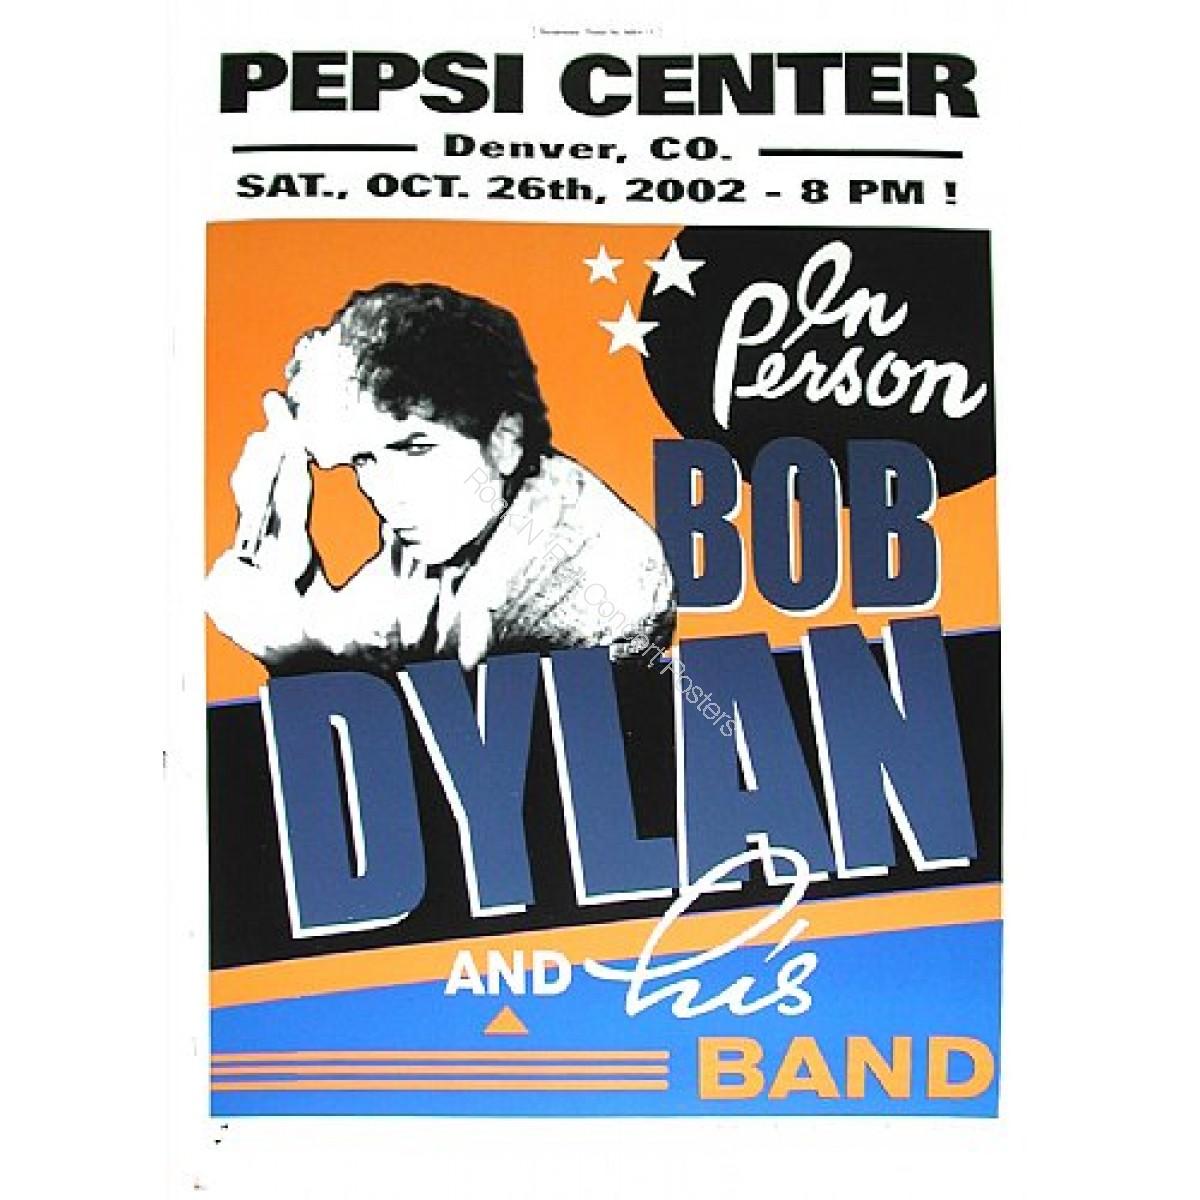 Bob Dylan @ The Pepsi Center Denver CO.